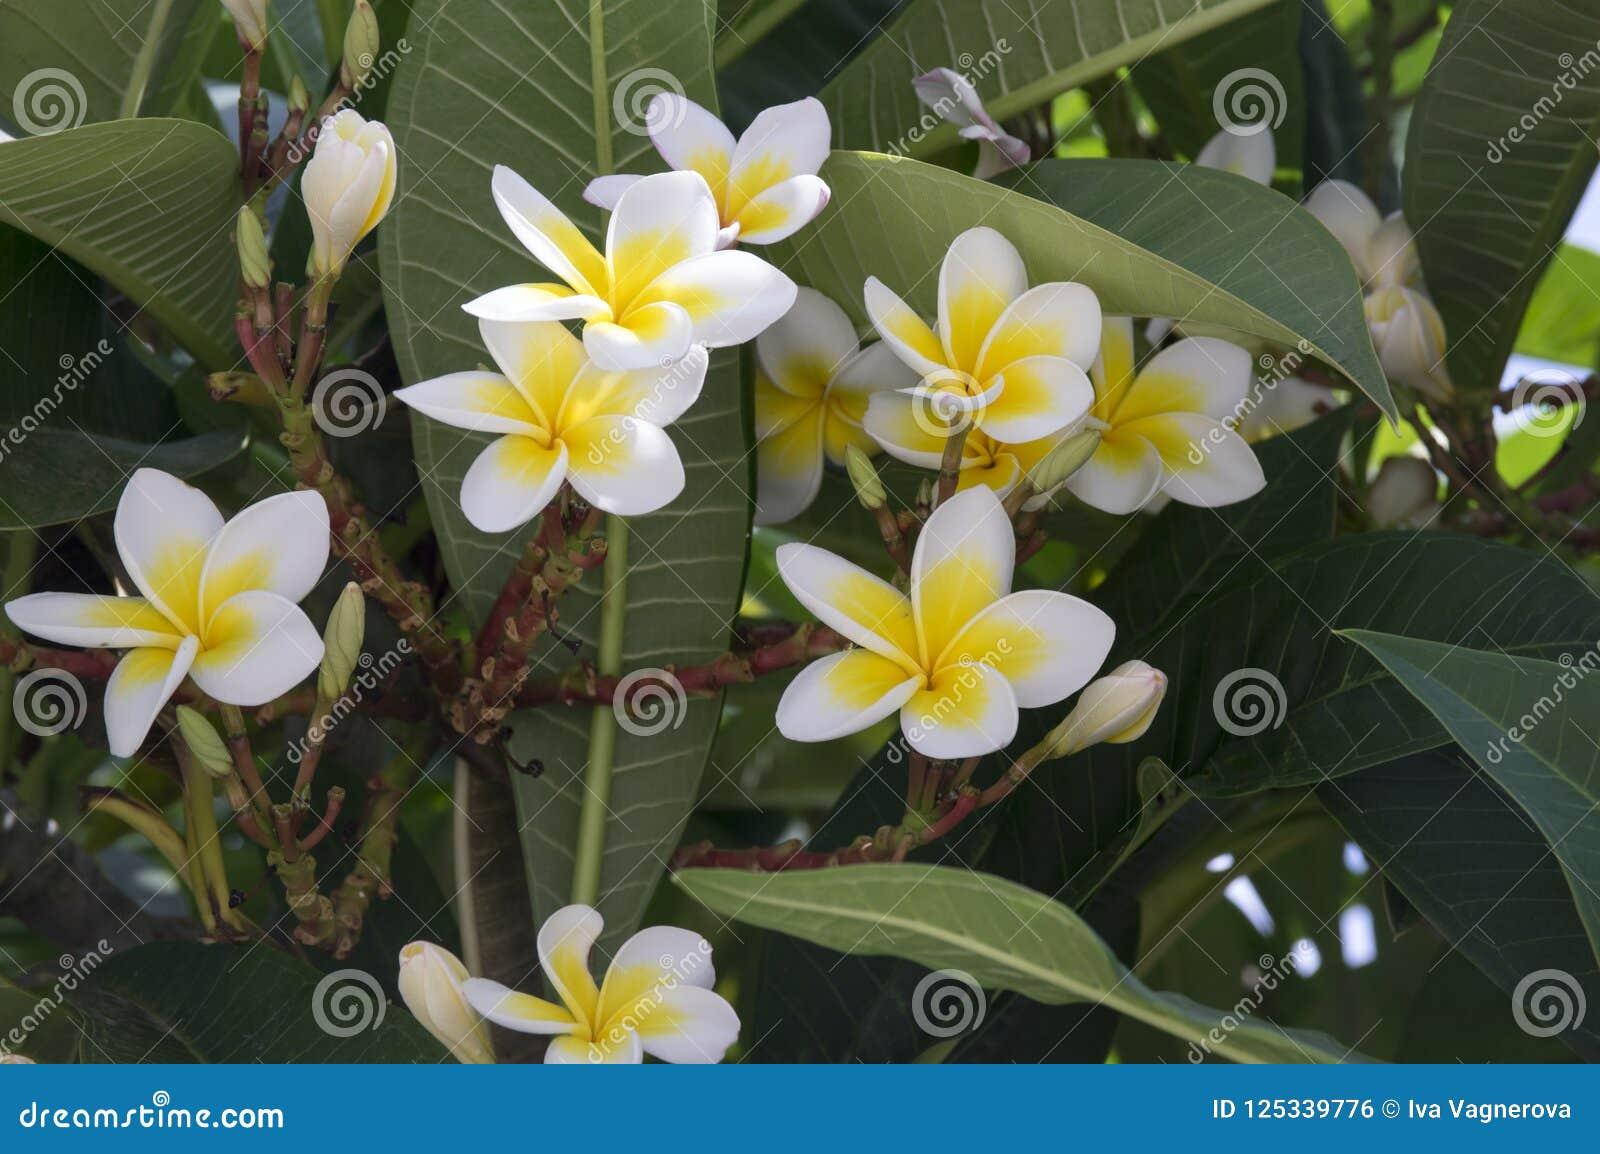 Plumeria Alba Tropical Evergreen Shrub Flowers In Bloom White